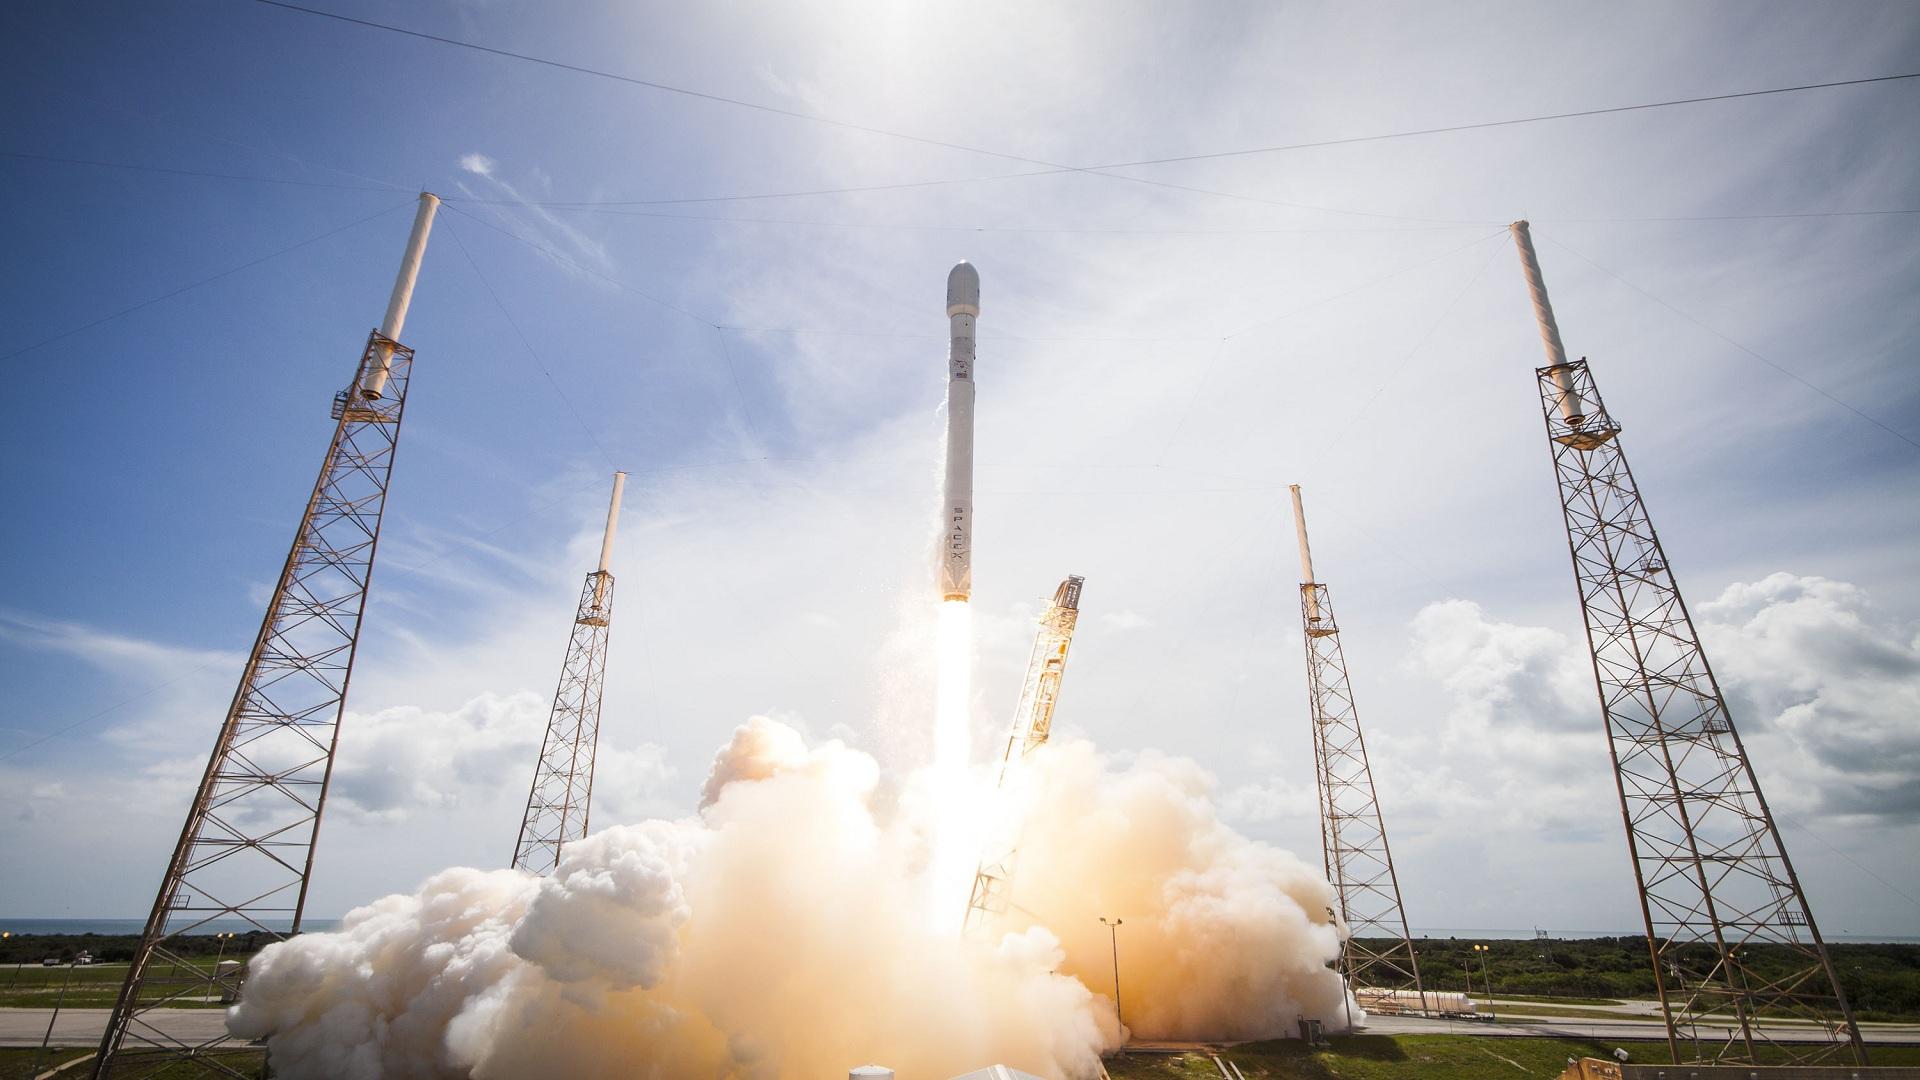 spacex launch desktop wallpaper 59809